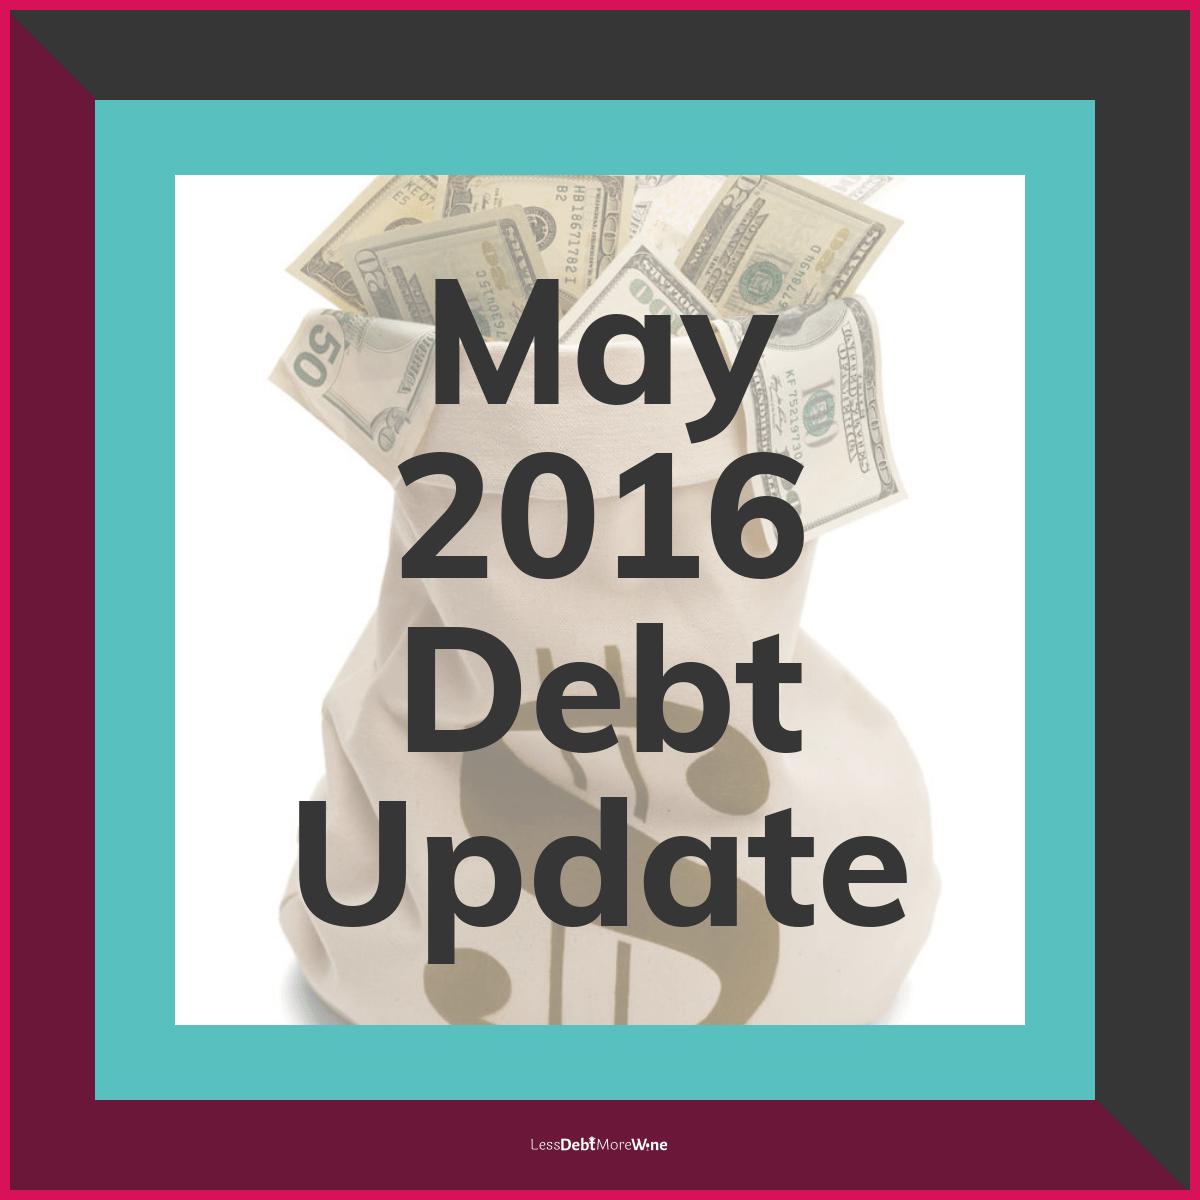 May 2016 Debt Update, debt payoff progress